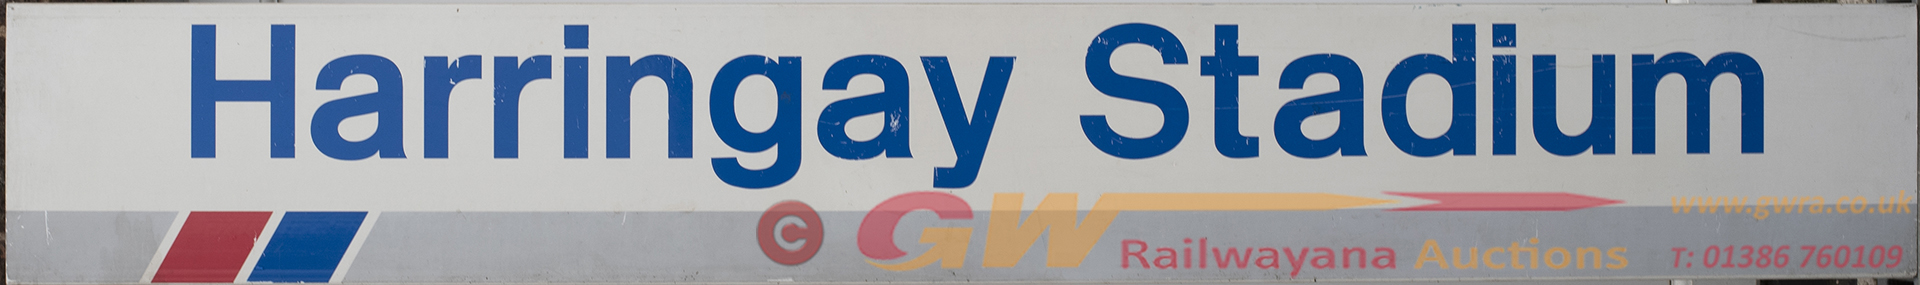 Network South East Station Sign HARRINGAY STADIUM